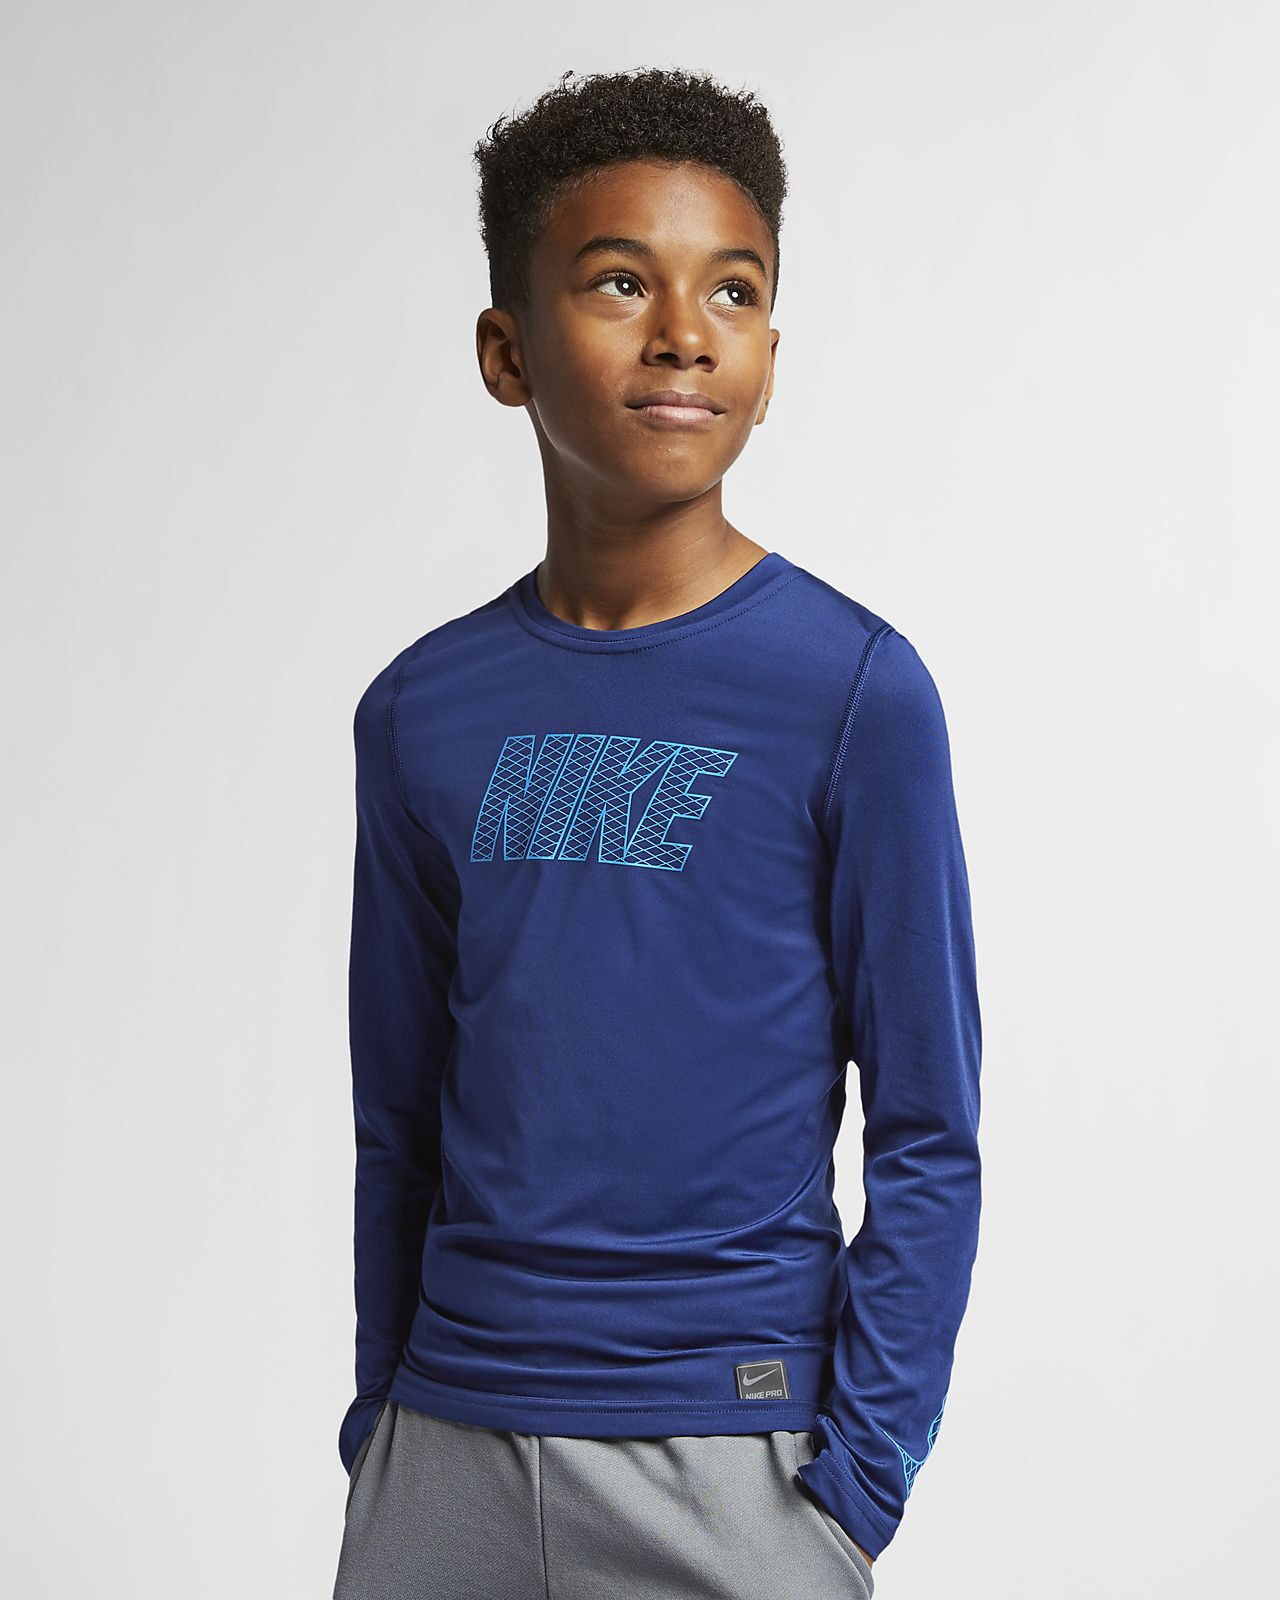 Nike Pro Langarm-Trainingsoberteil für ältere Kinder (Jungen)